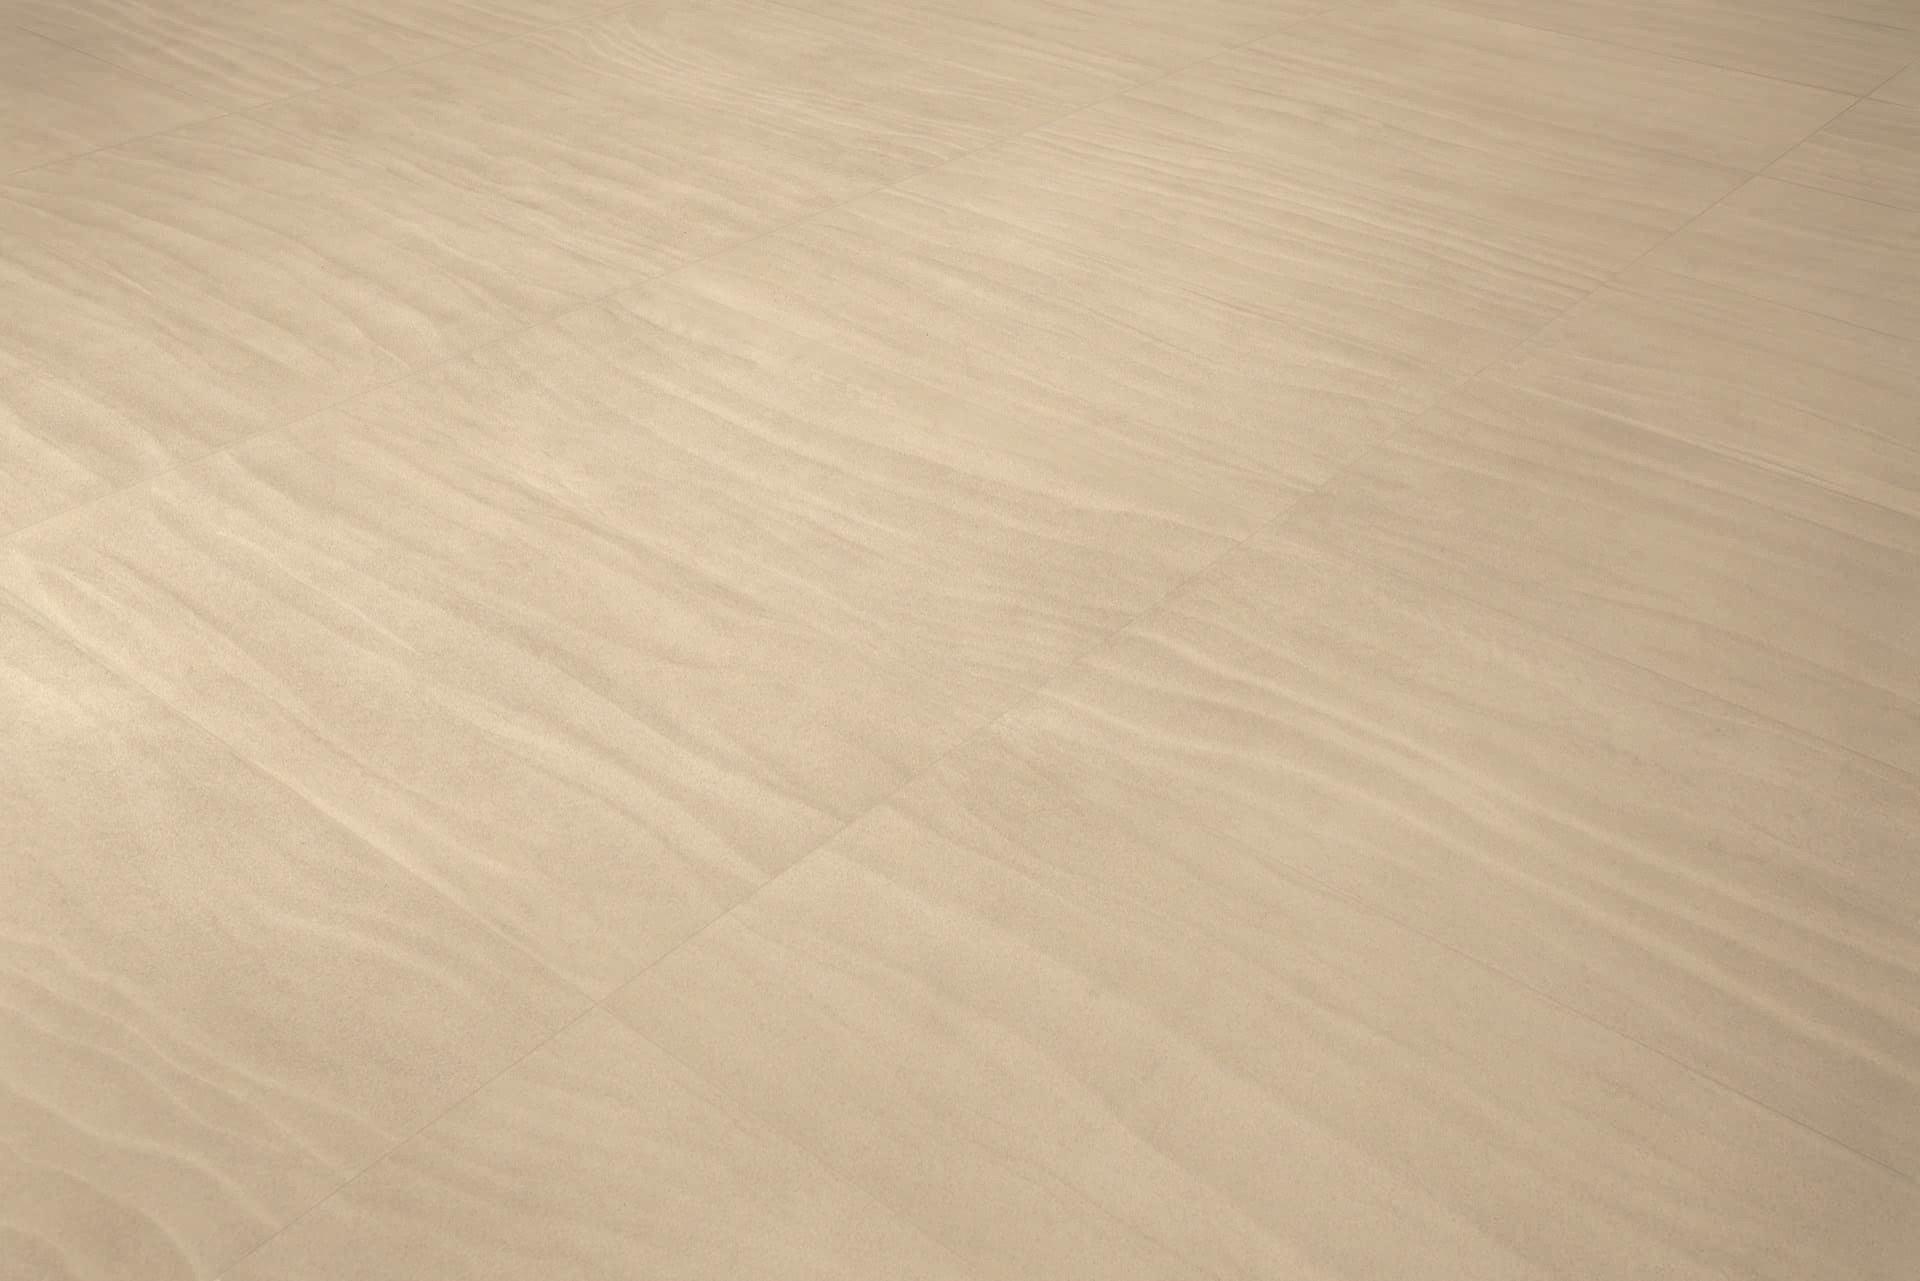 Zerodesign Sabbia Thar Beige Naturale Pav